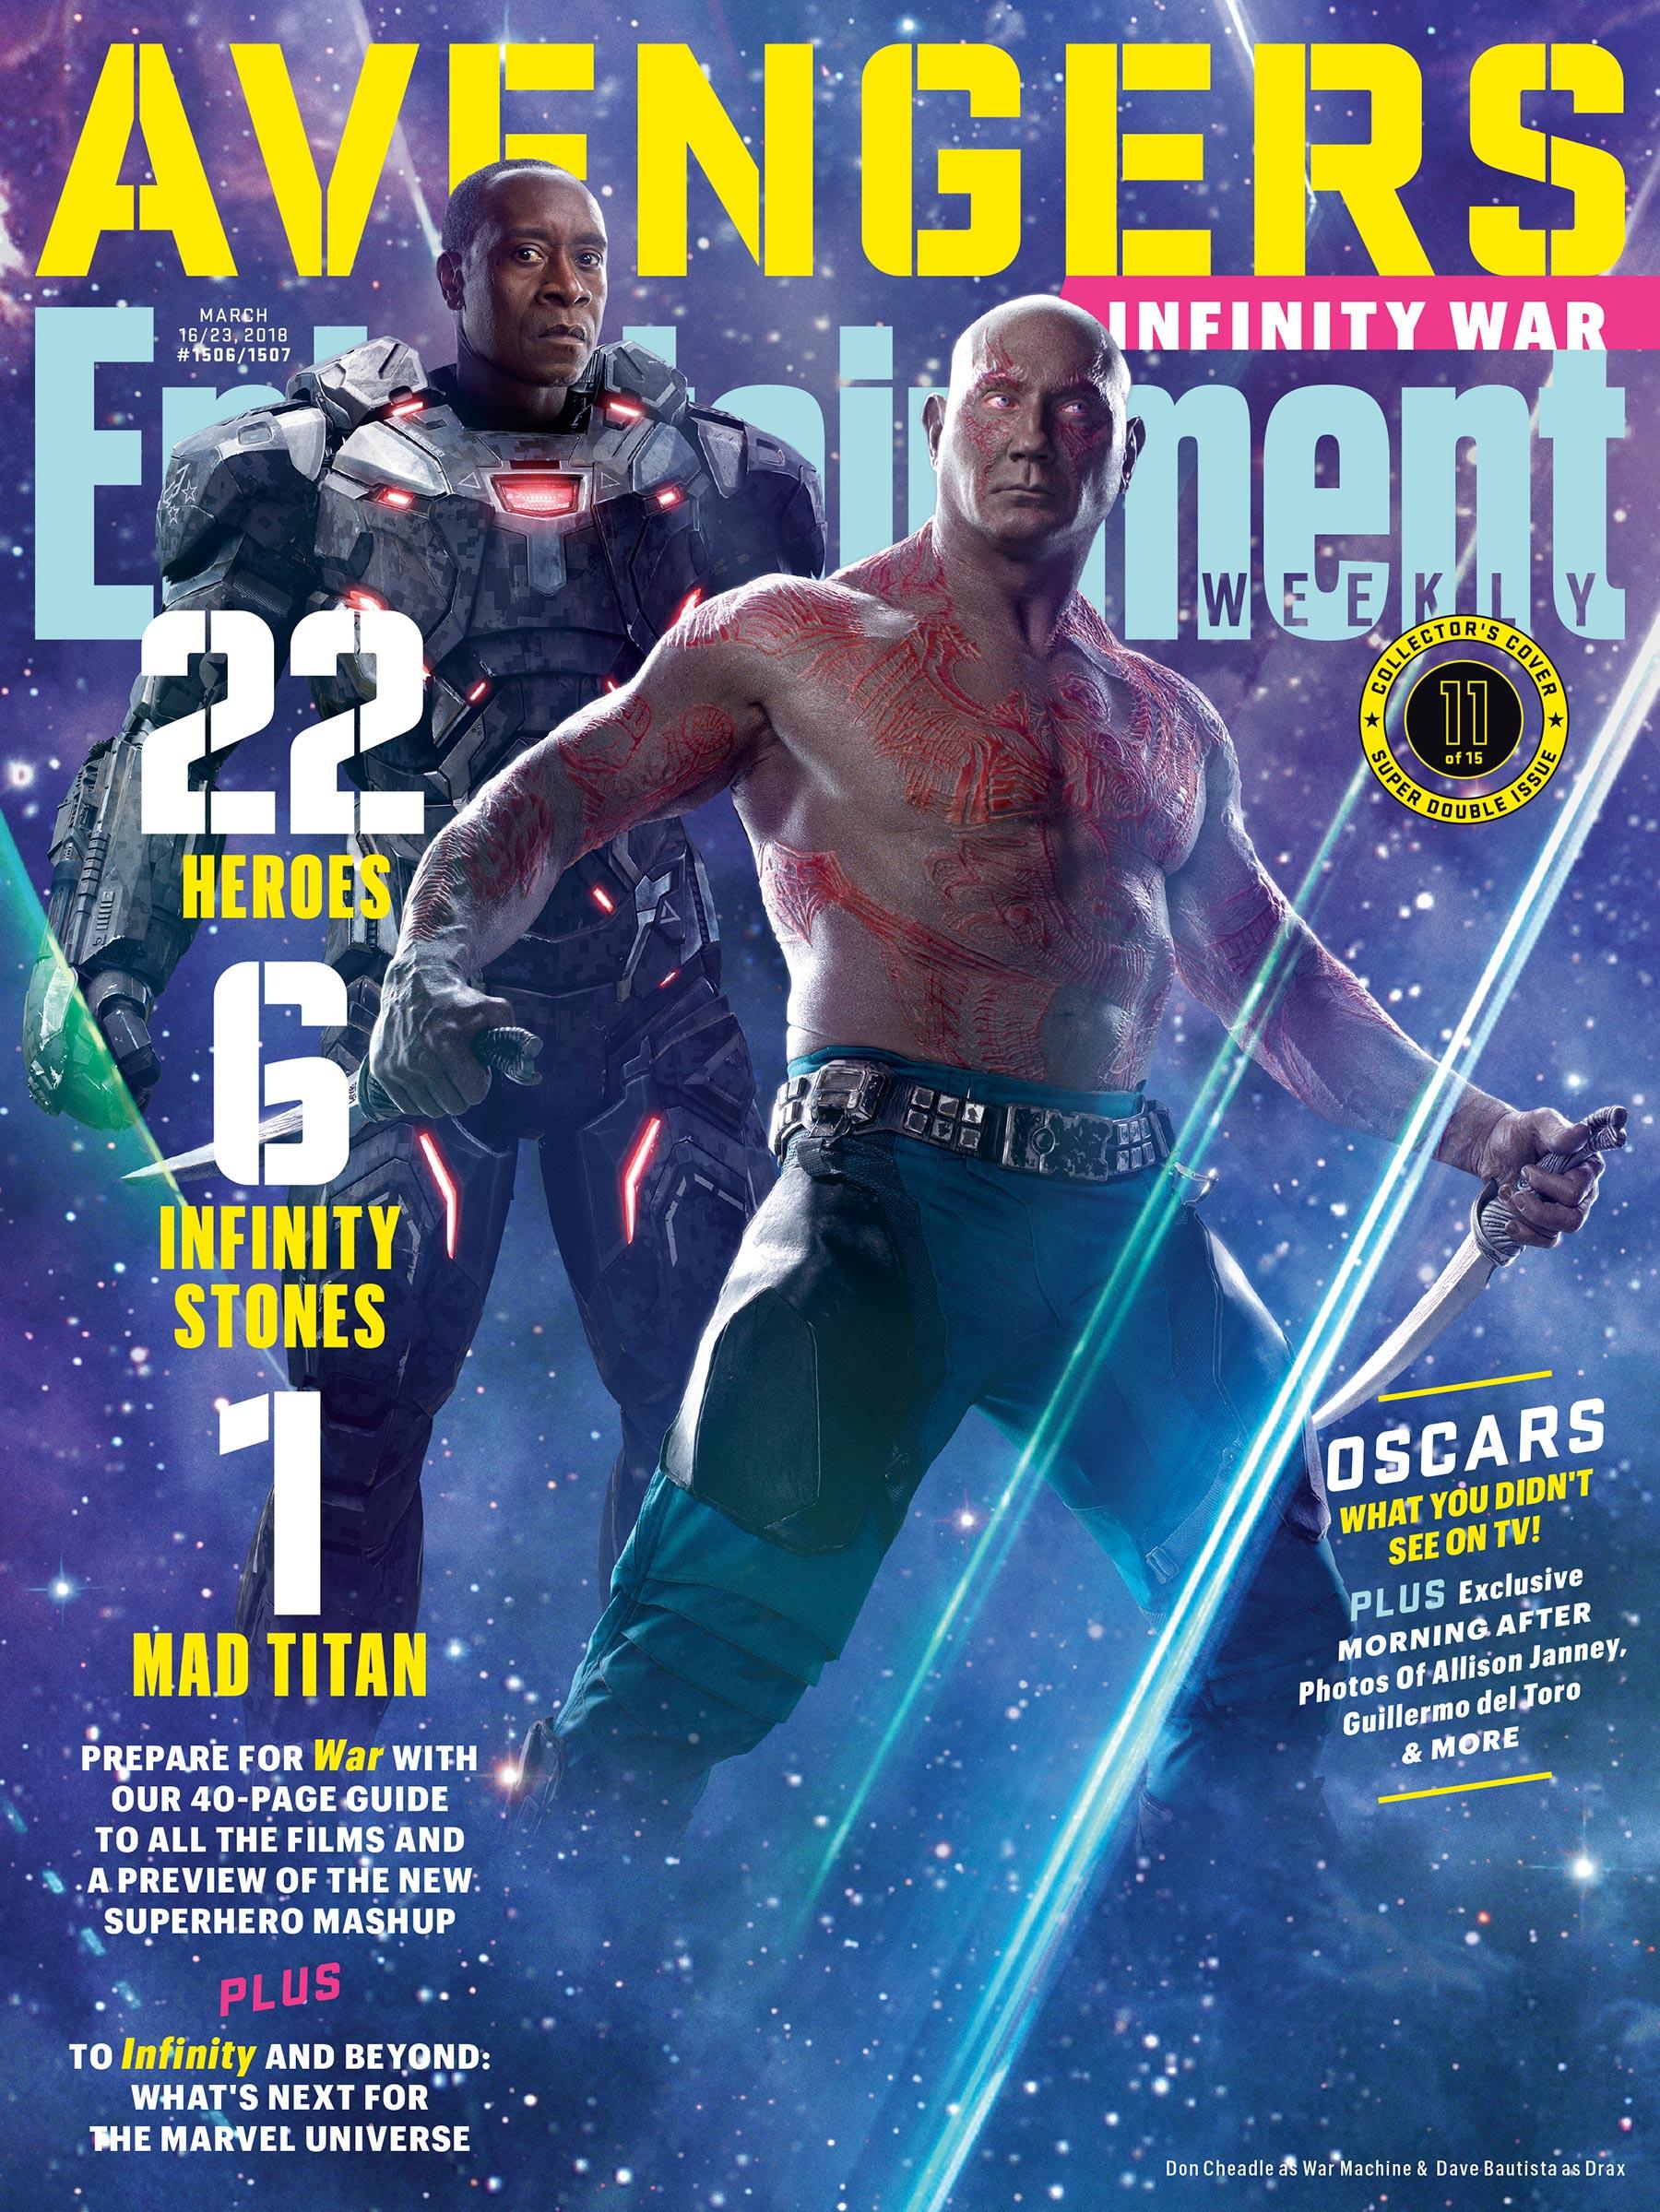 11-ewcover-avengers-war-machine-drax